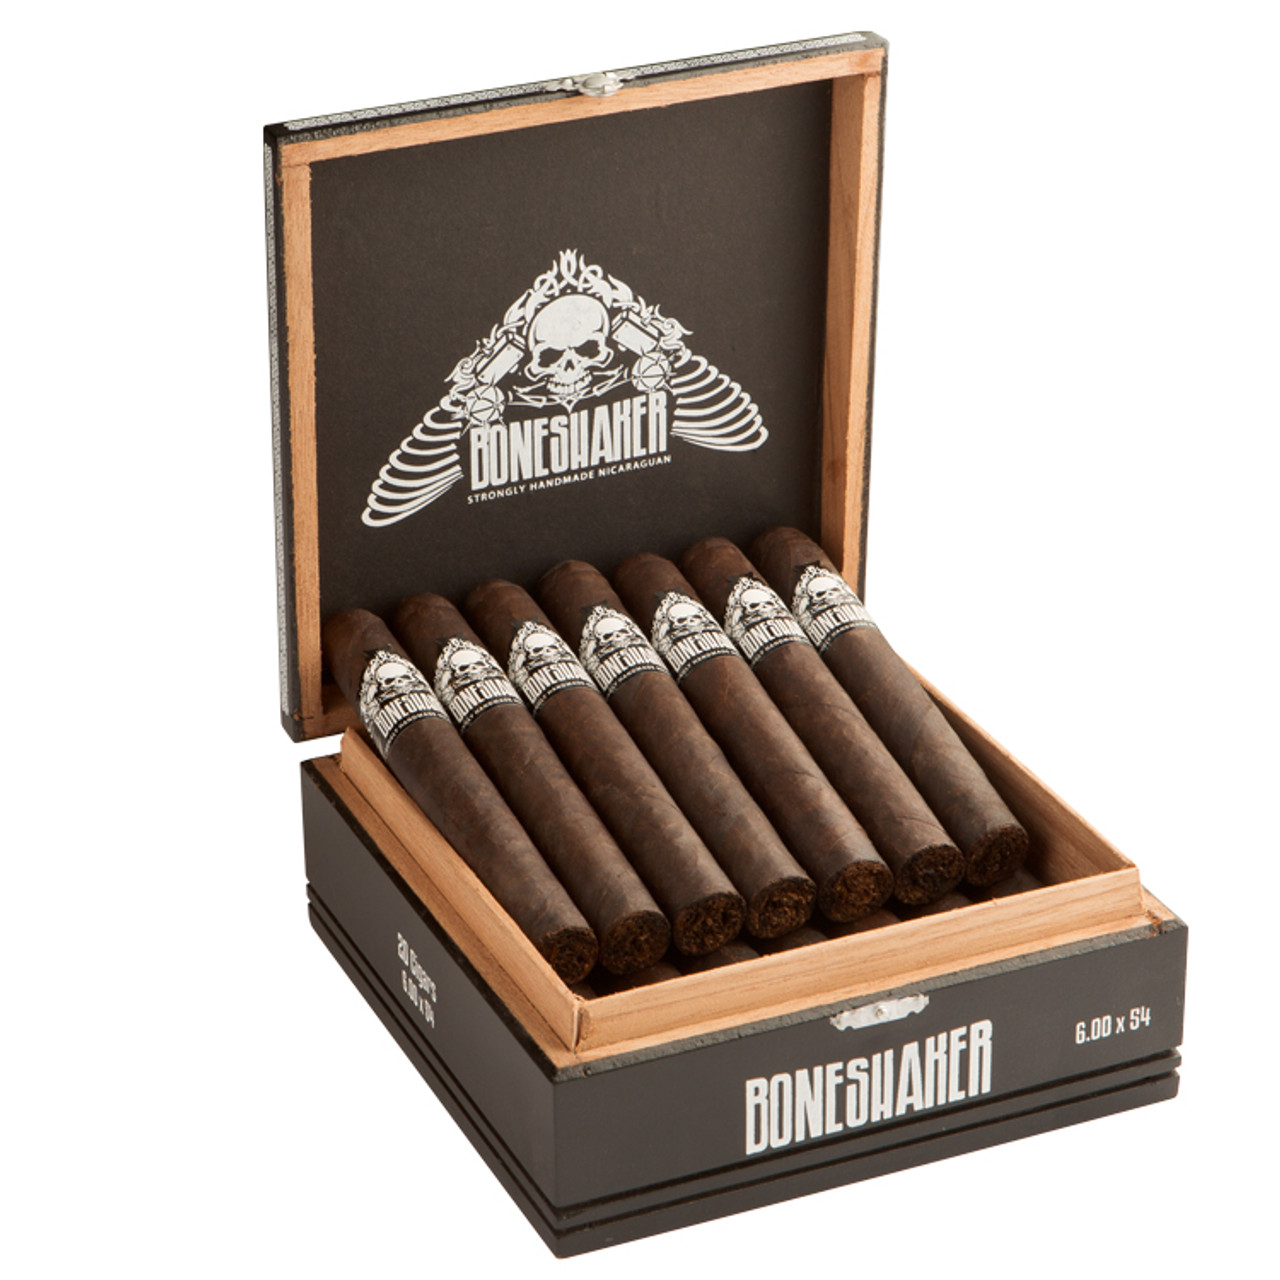 Boneshaker Full Body Cast Mace Cigars - 4.5 x 60 (Box of 20)